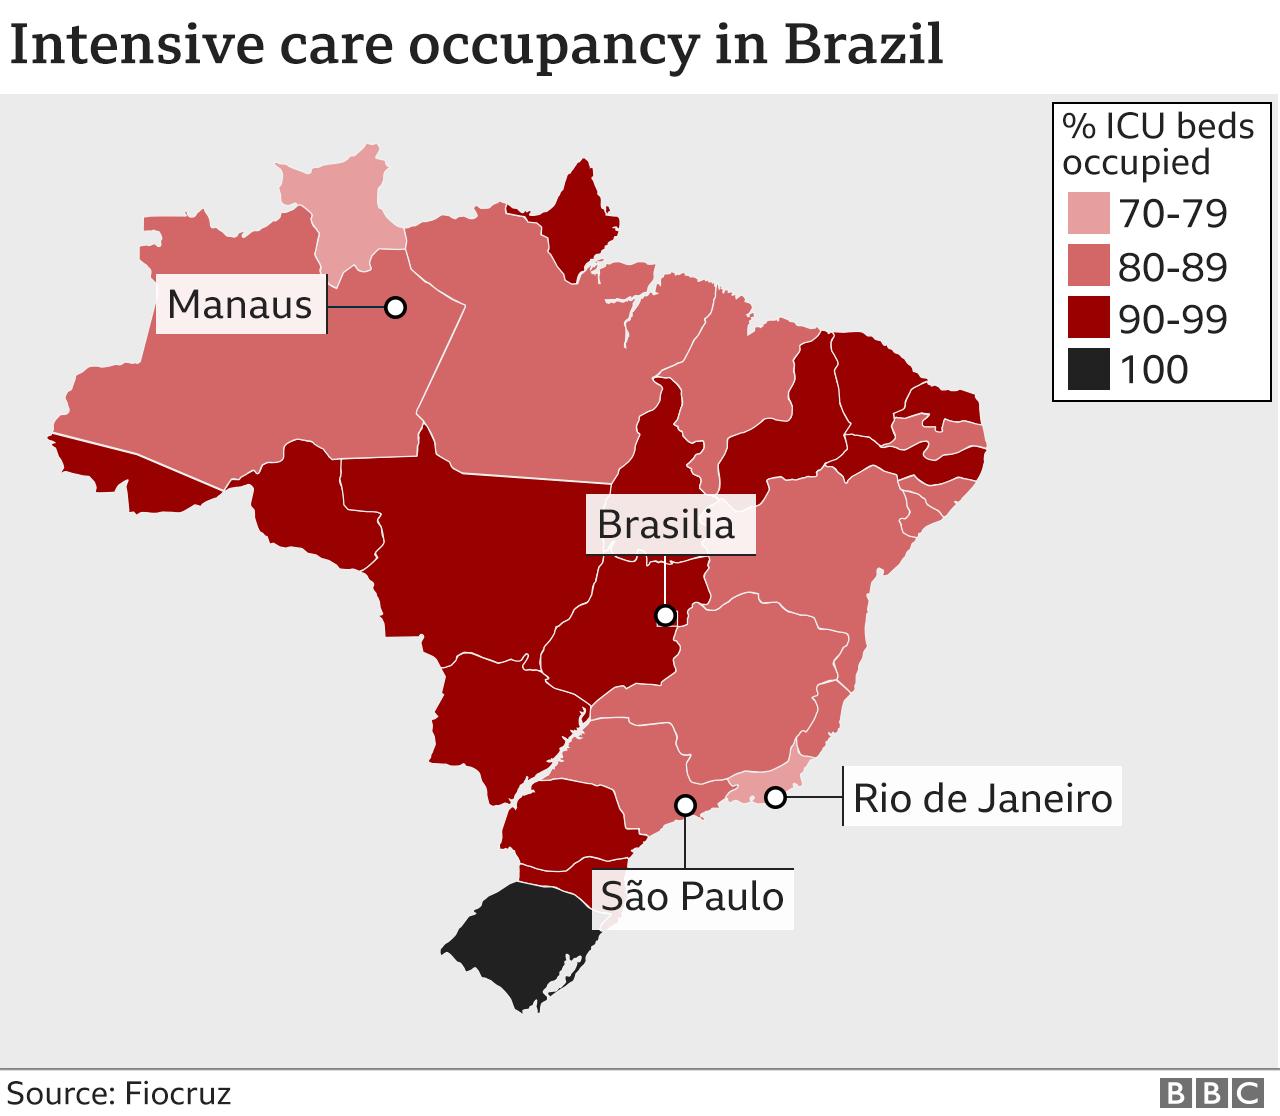 Map showing ICU occupancy across Brazil